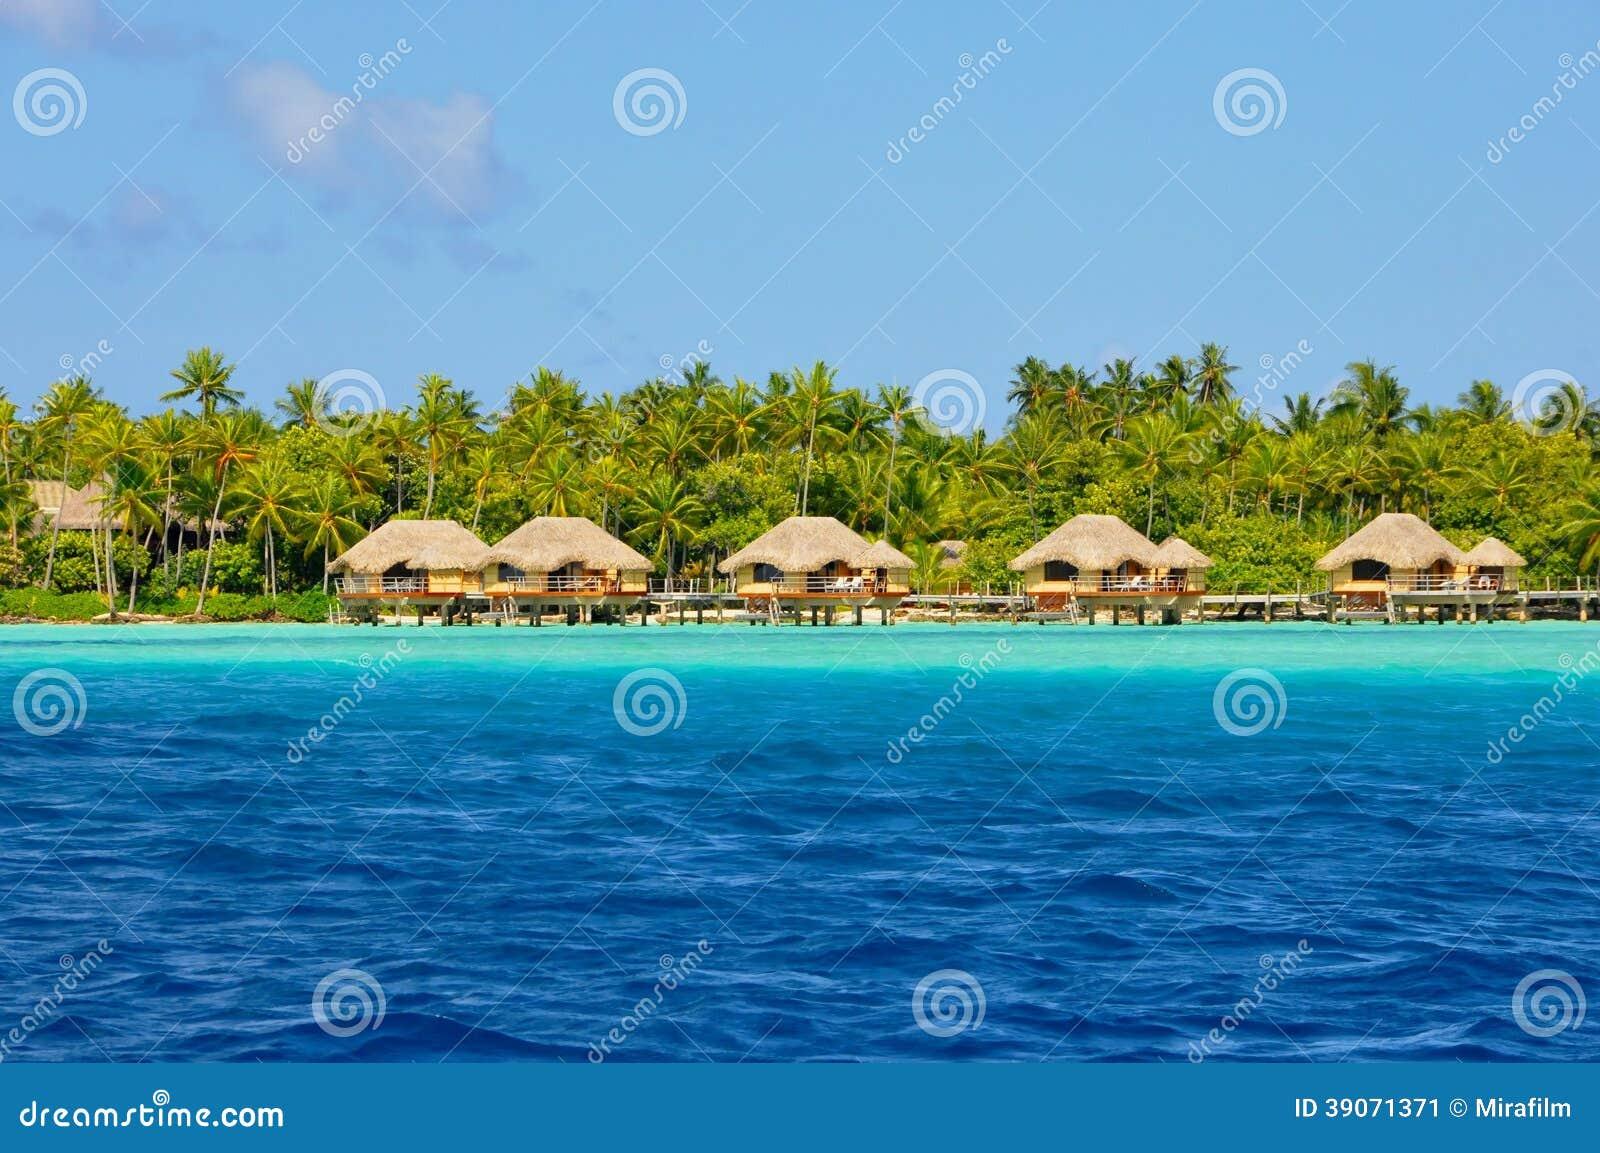 Tahaa, french polynesia stock image  Image of moorea - 39071371